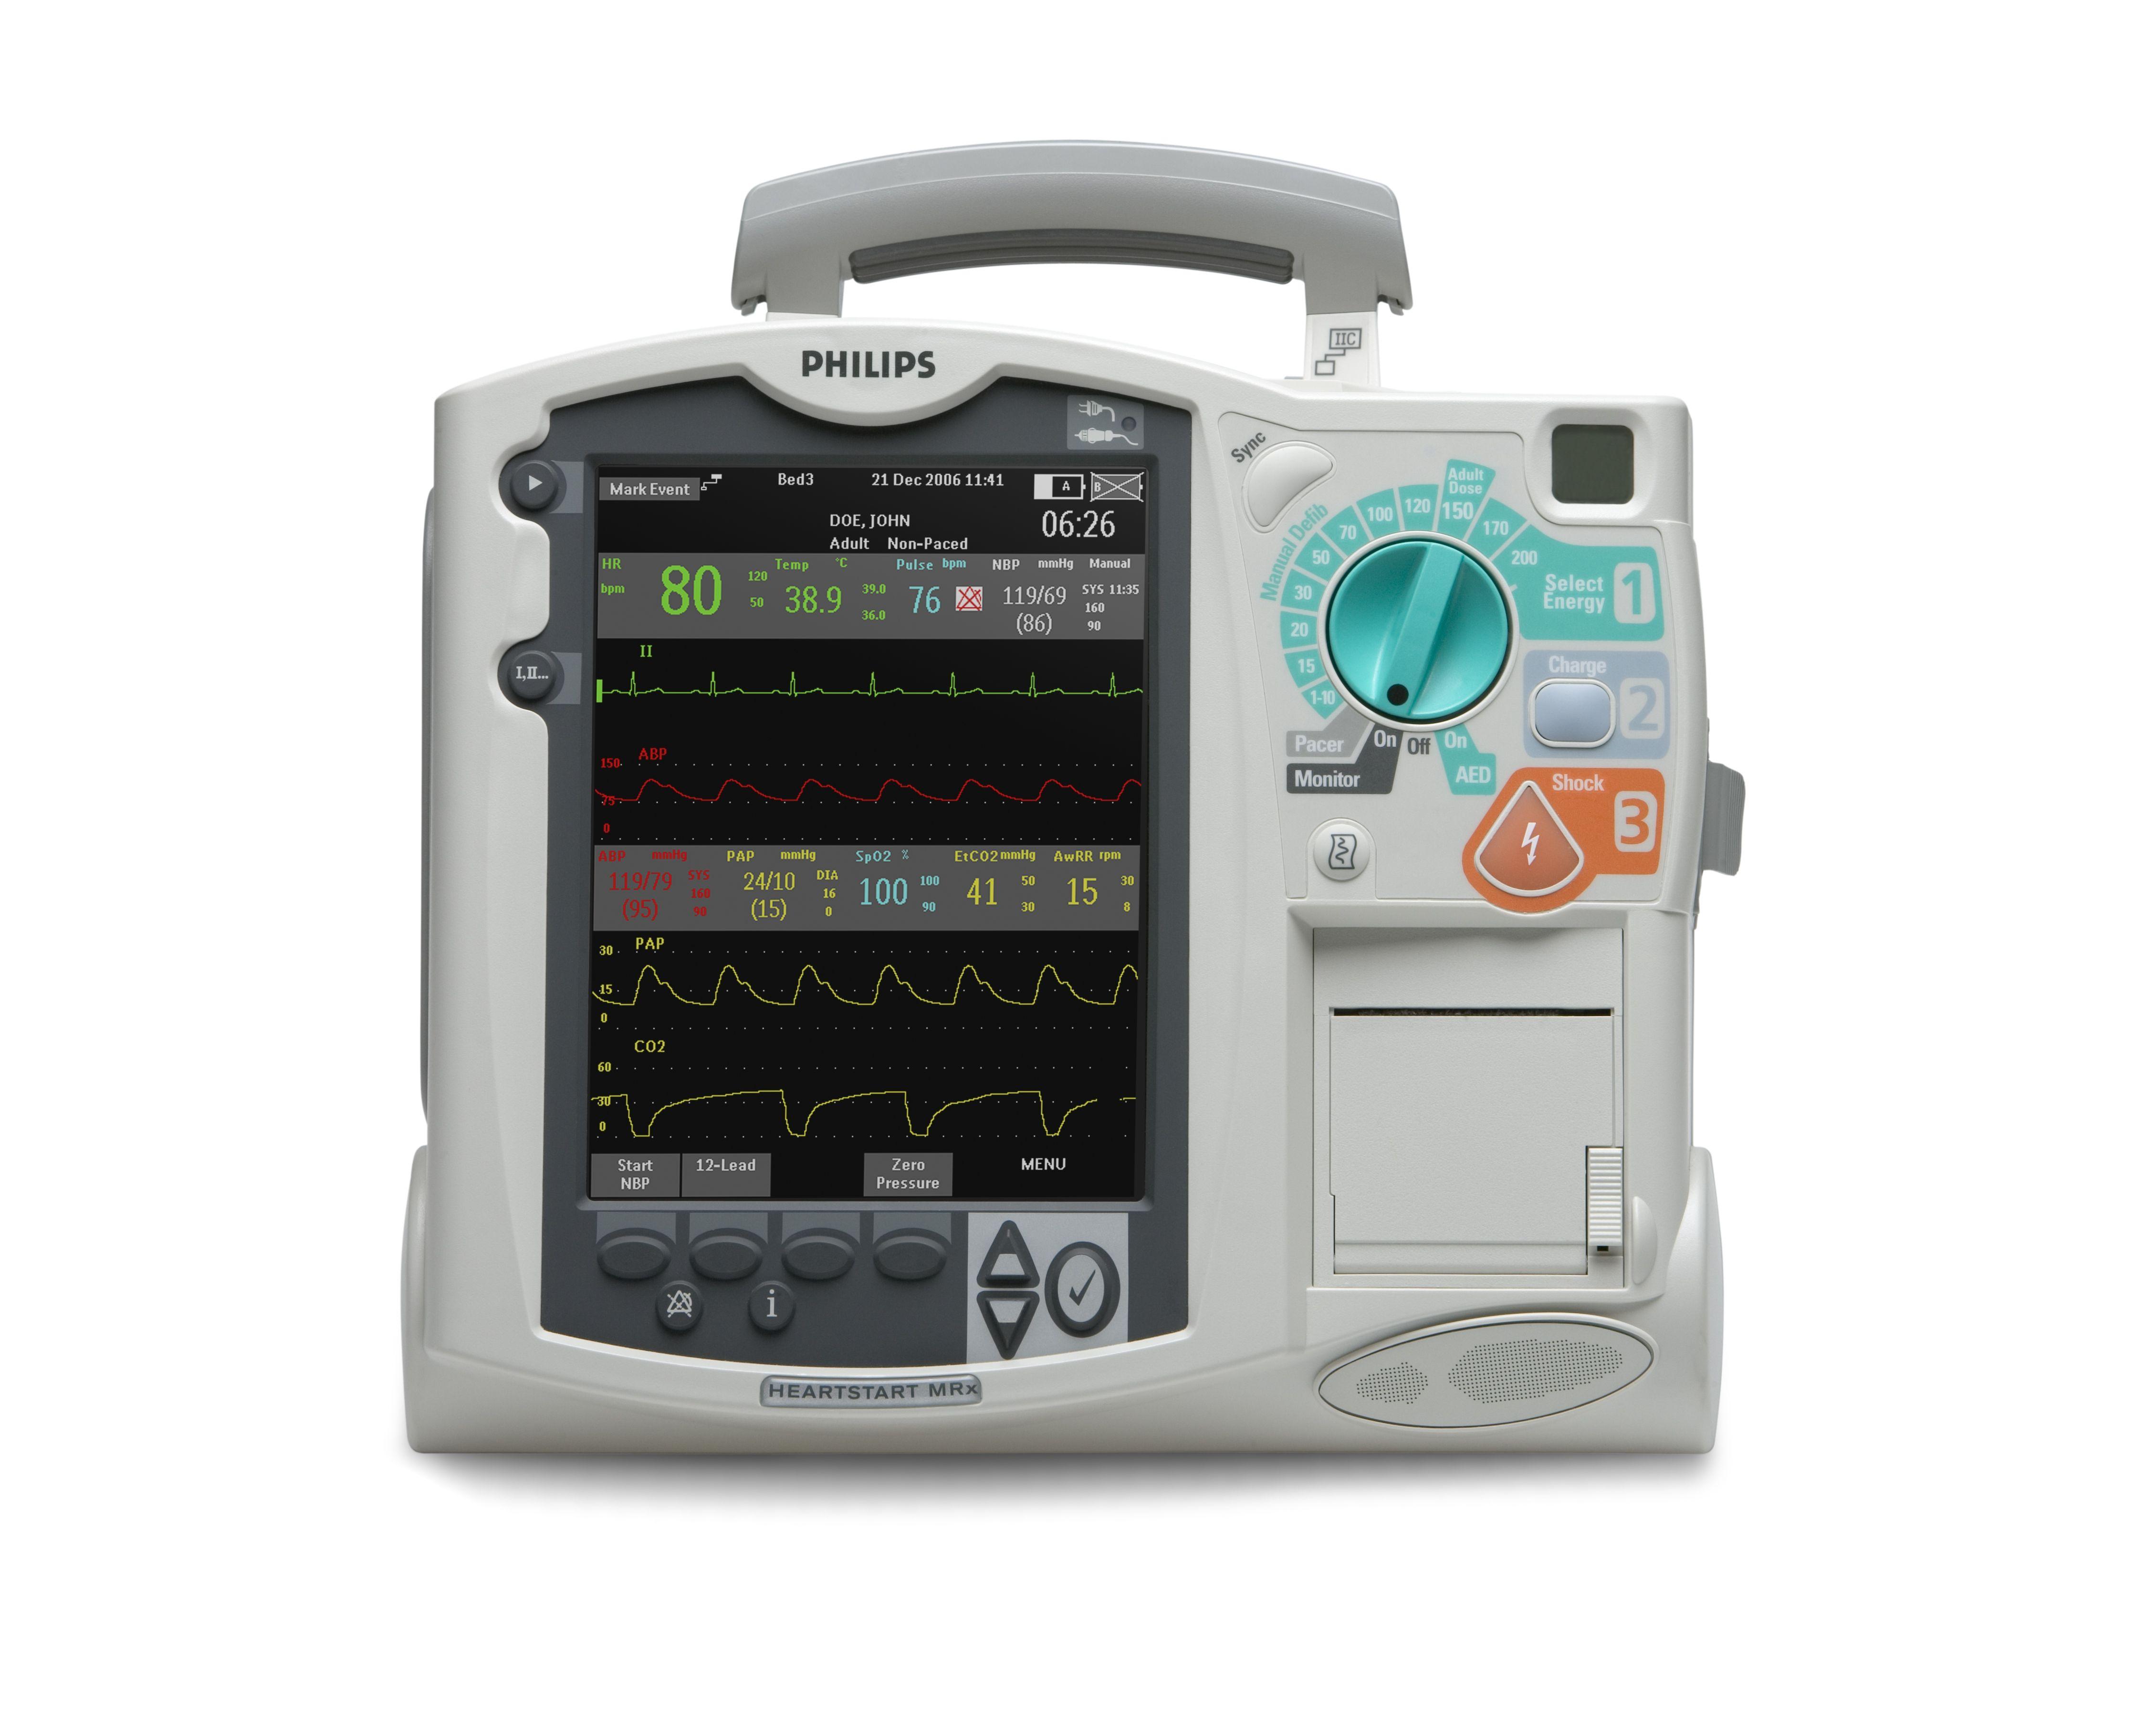 Philips Heartstart Mrx M3535a Defibrillator Model